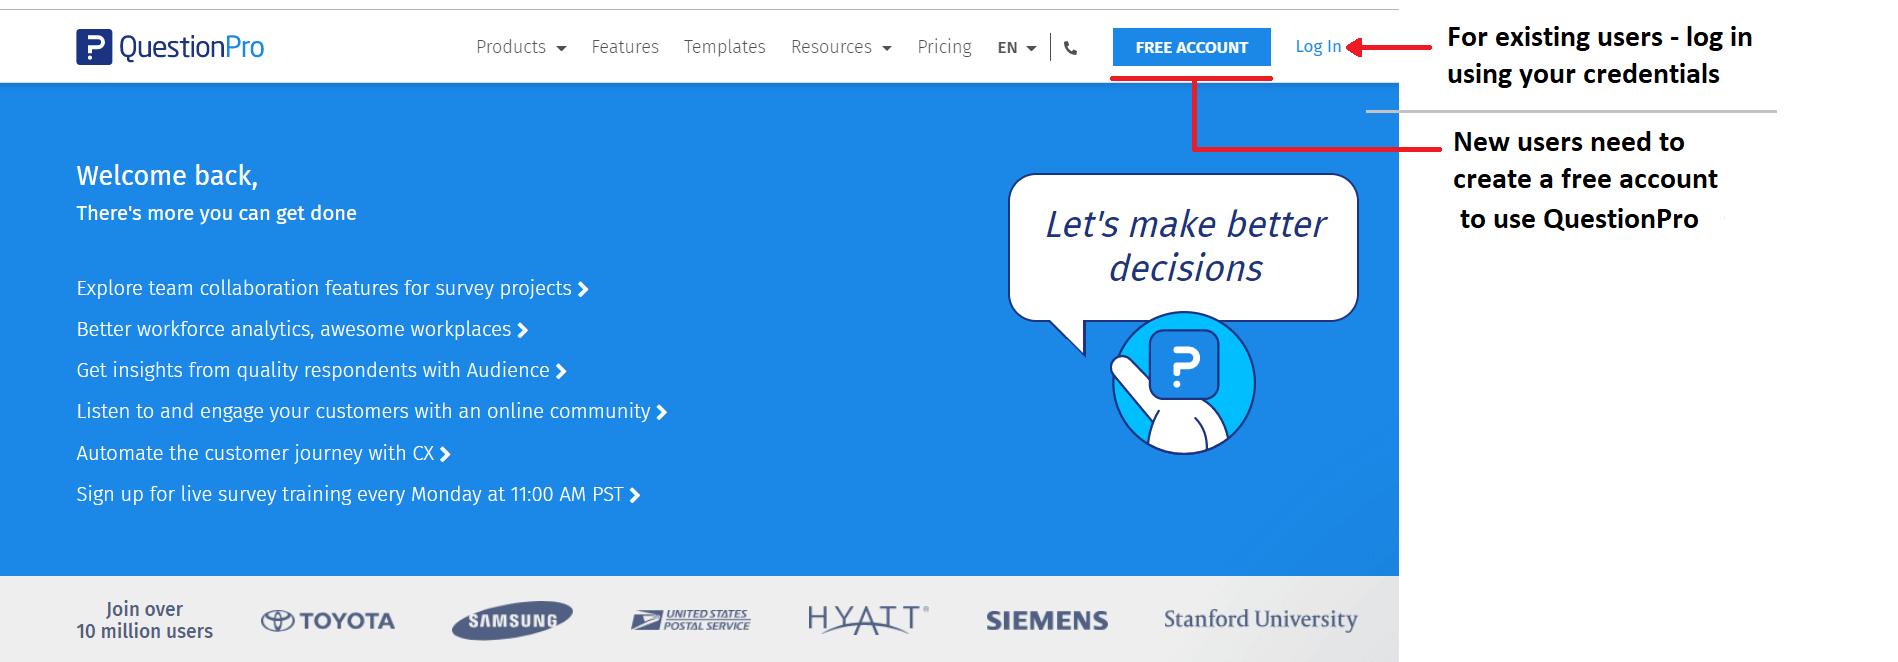 Login-or-create-a-free-account-1